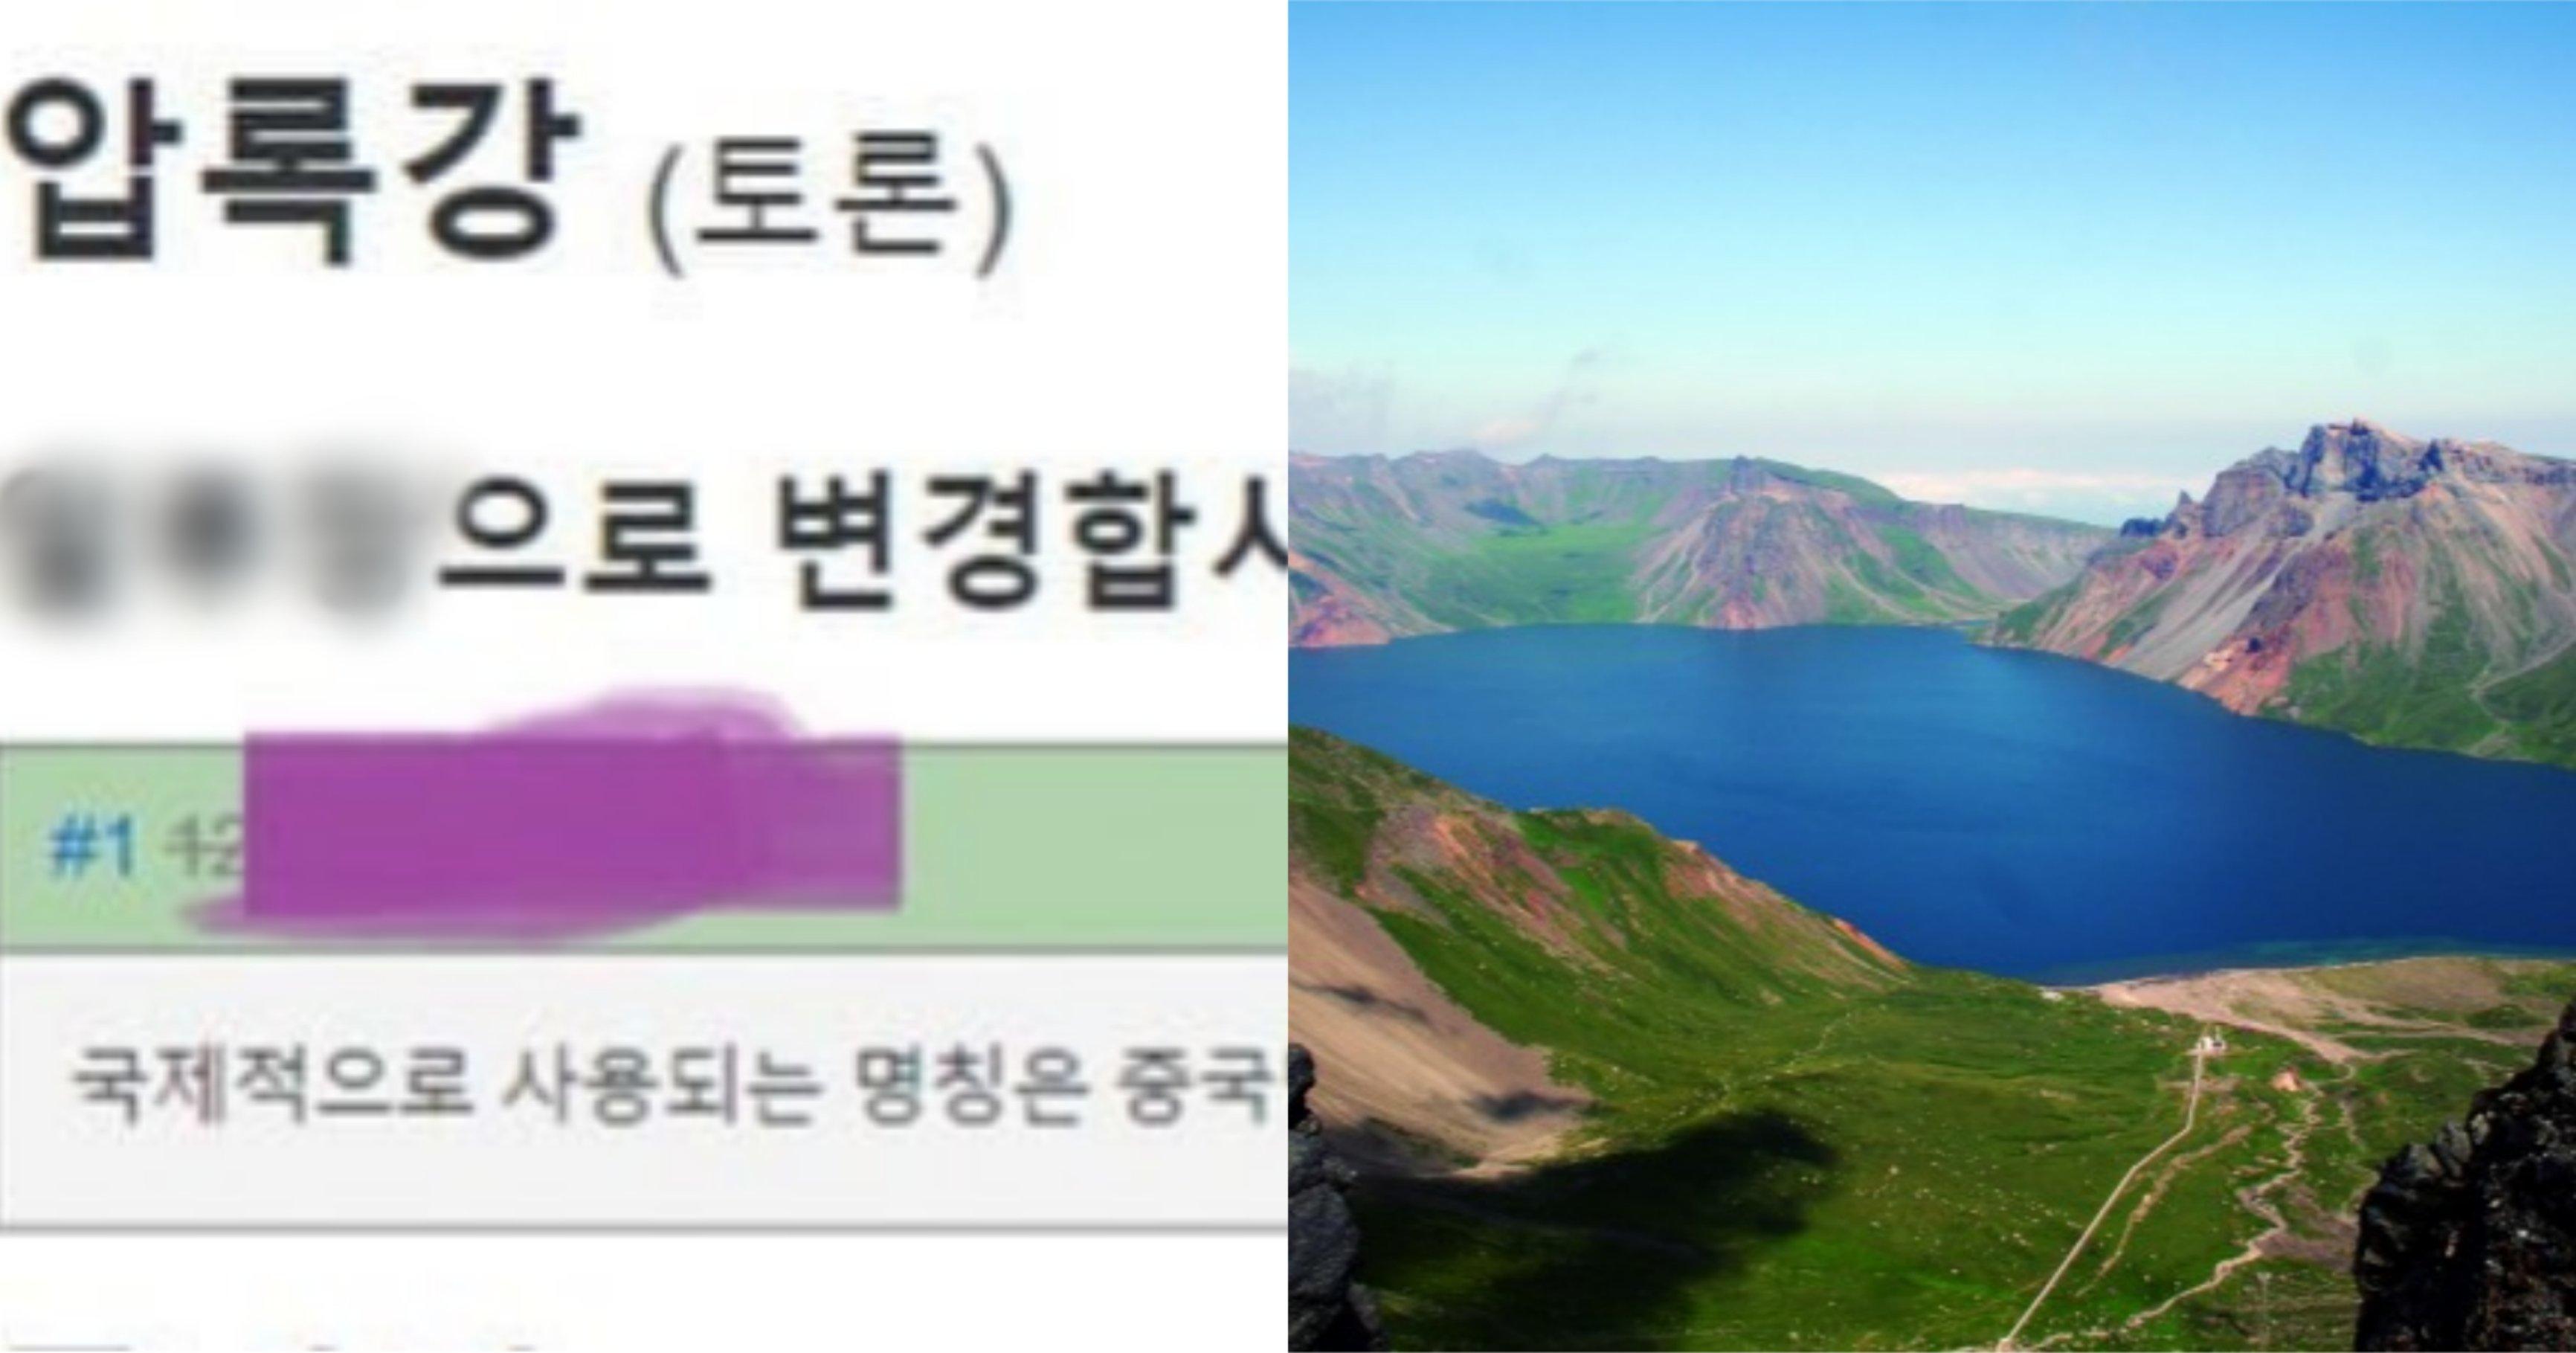 "kakaotalk 20211018 170449381.jpg?resize=412,232 - ""압록강을 XXX으로..."" 중국 유학생들이 한국 온라인 커뮤니티에서 하고 있는 짓"